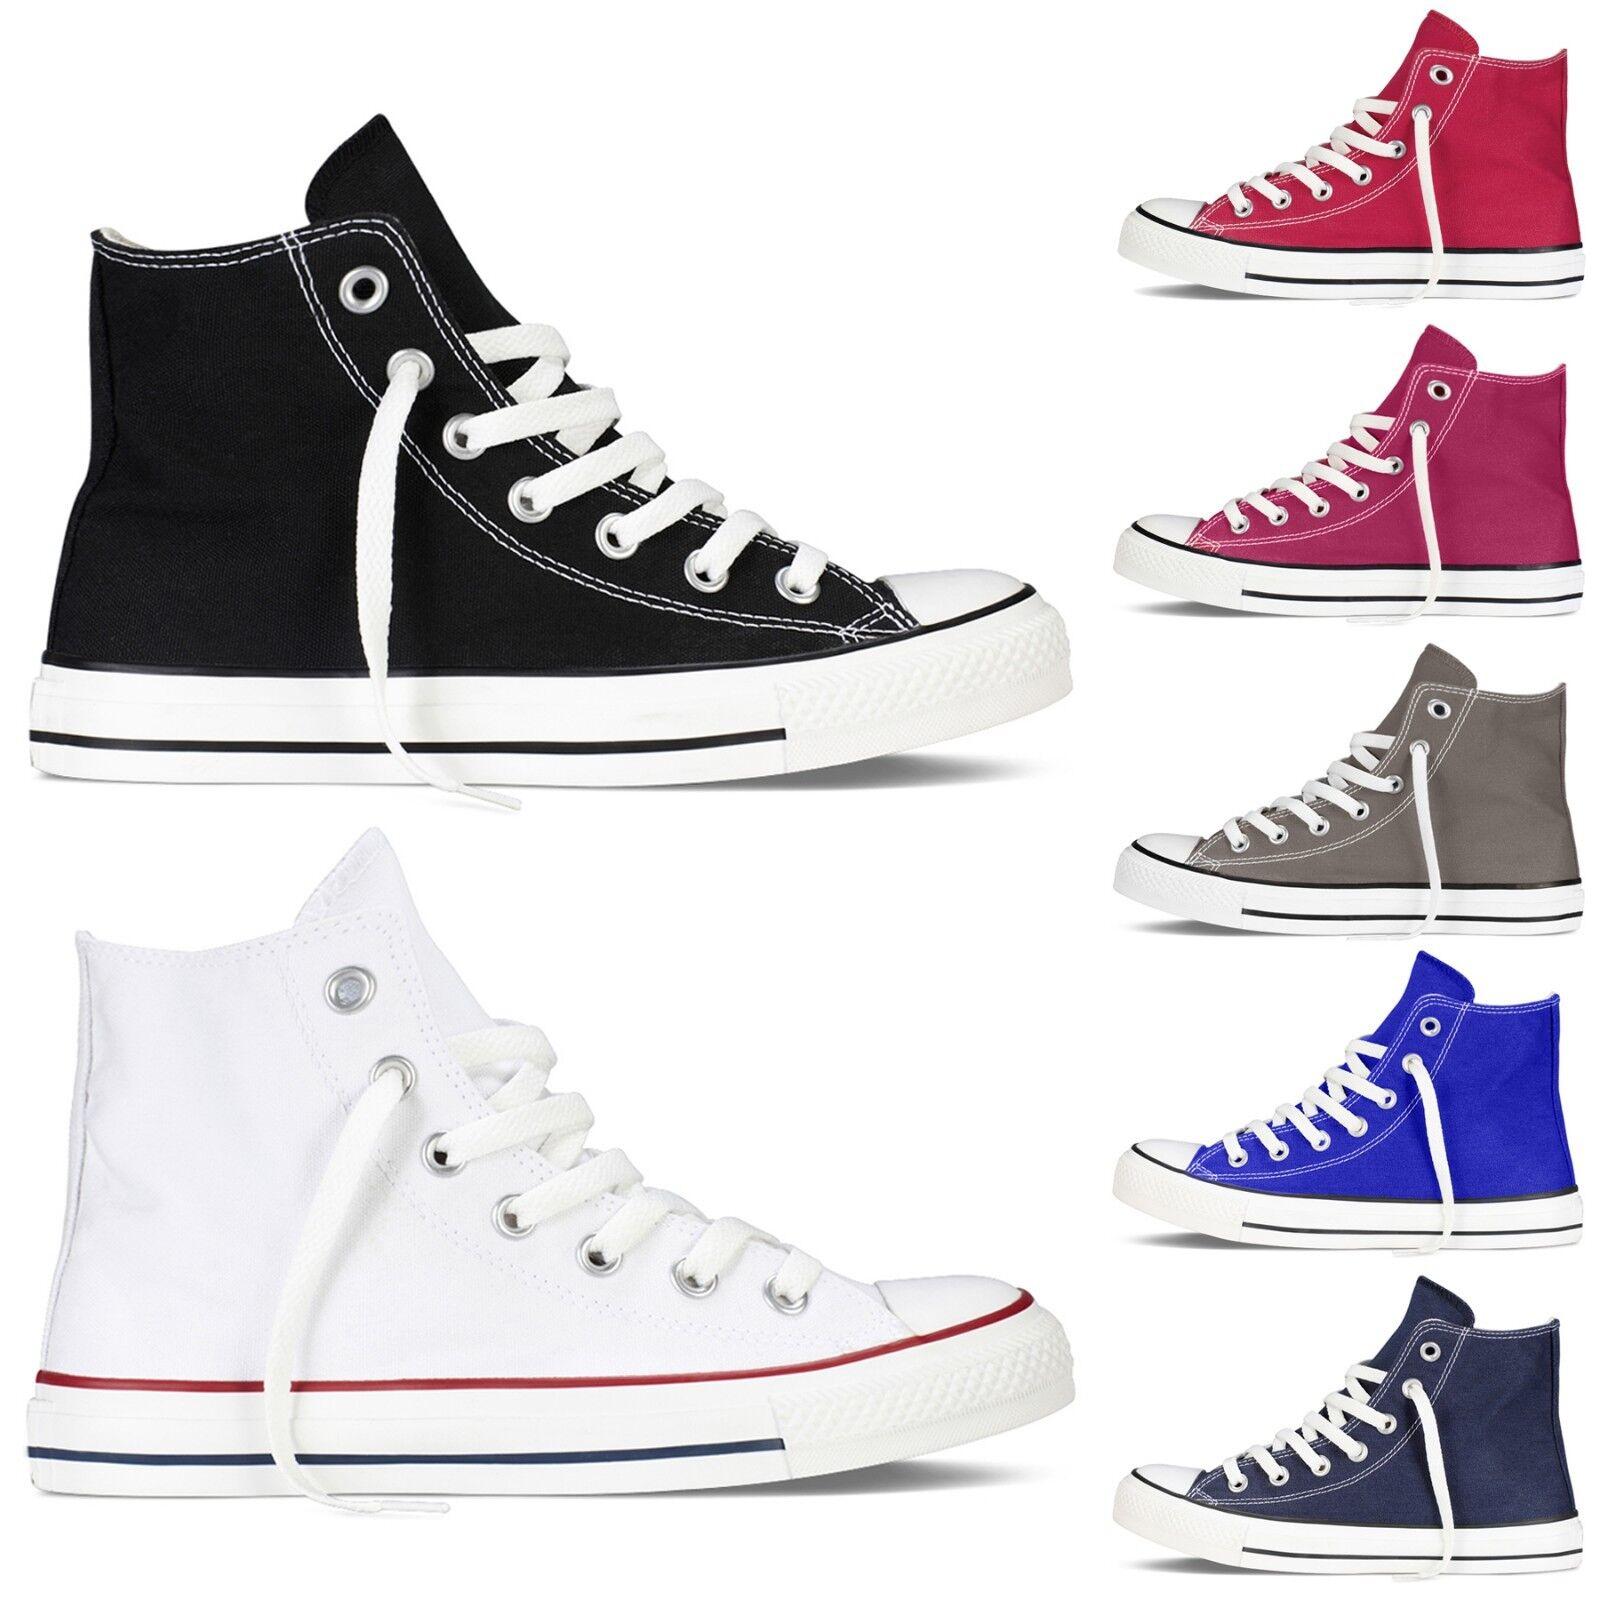 7fc05492c4 Scarpe Da Ginnastica Uomo Donna Sneakers Alte Casual Comode Vari ...